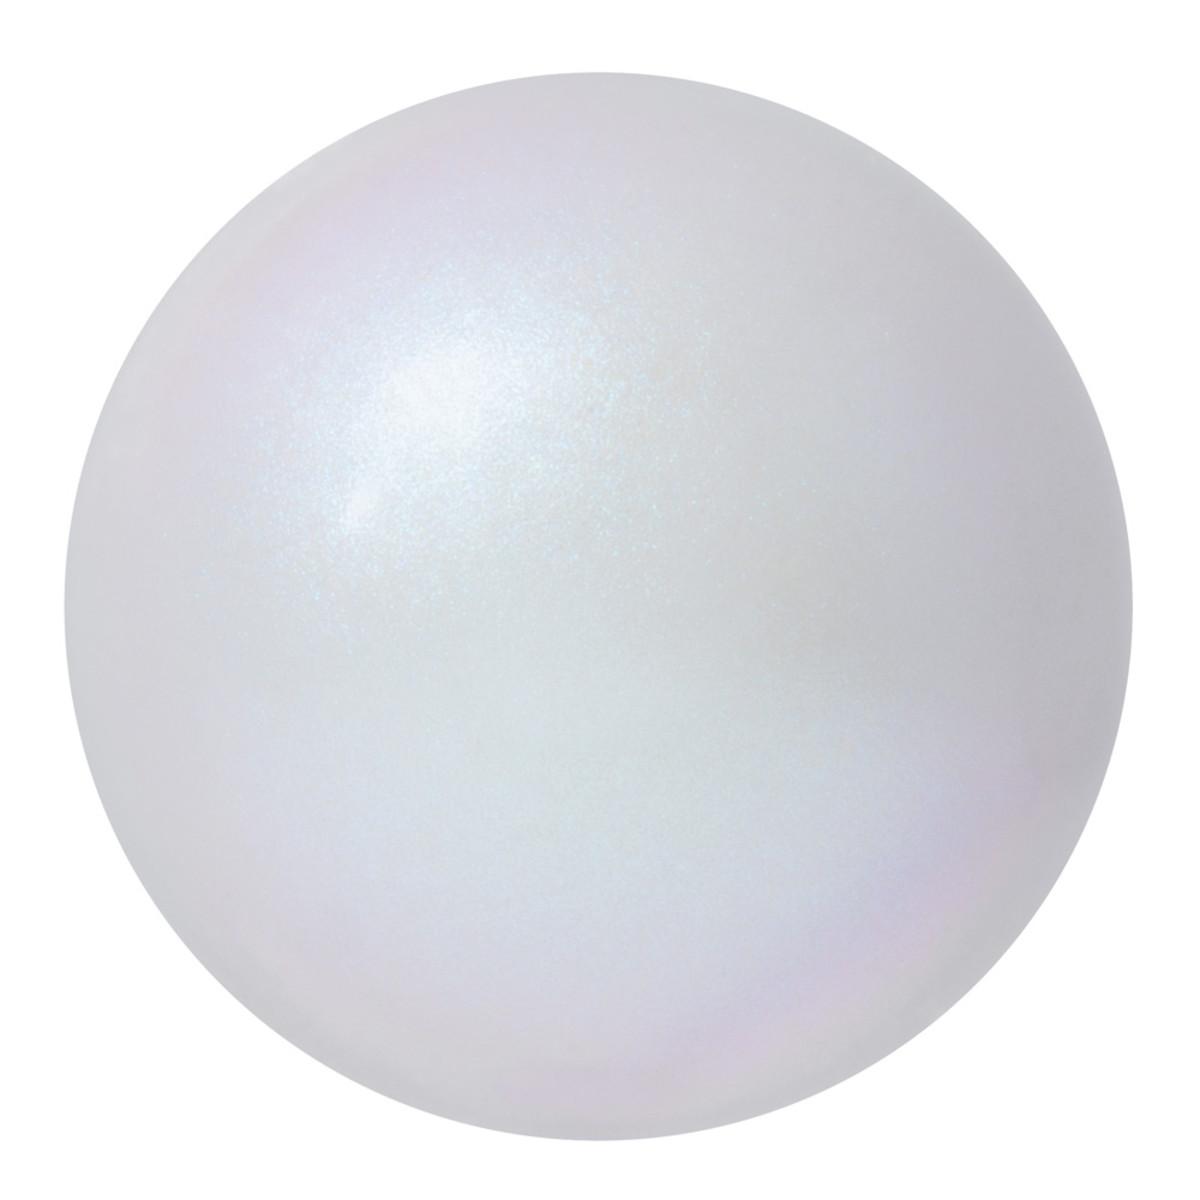 Swarovski Elements Perlen Crystal Pearls 8mm Iridescent Dove Pearls 50 Stück